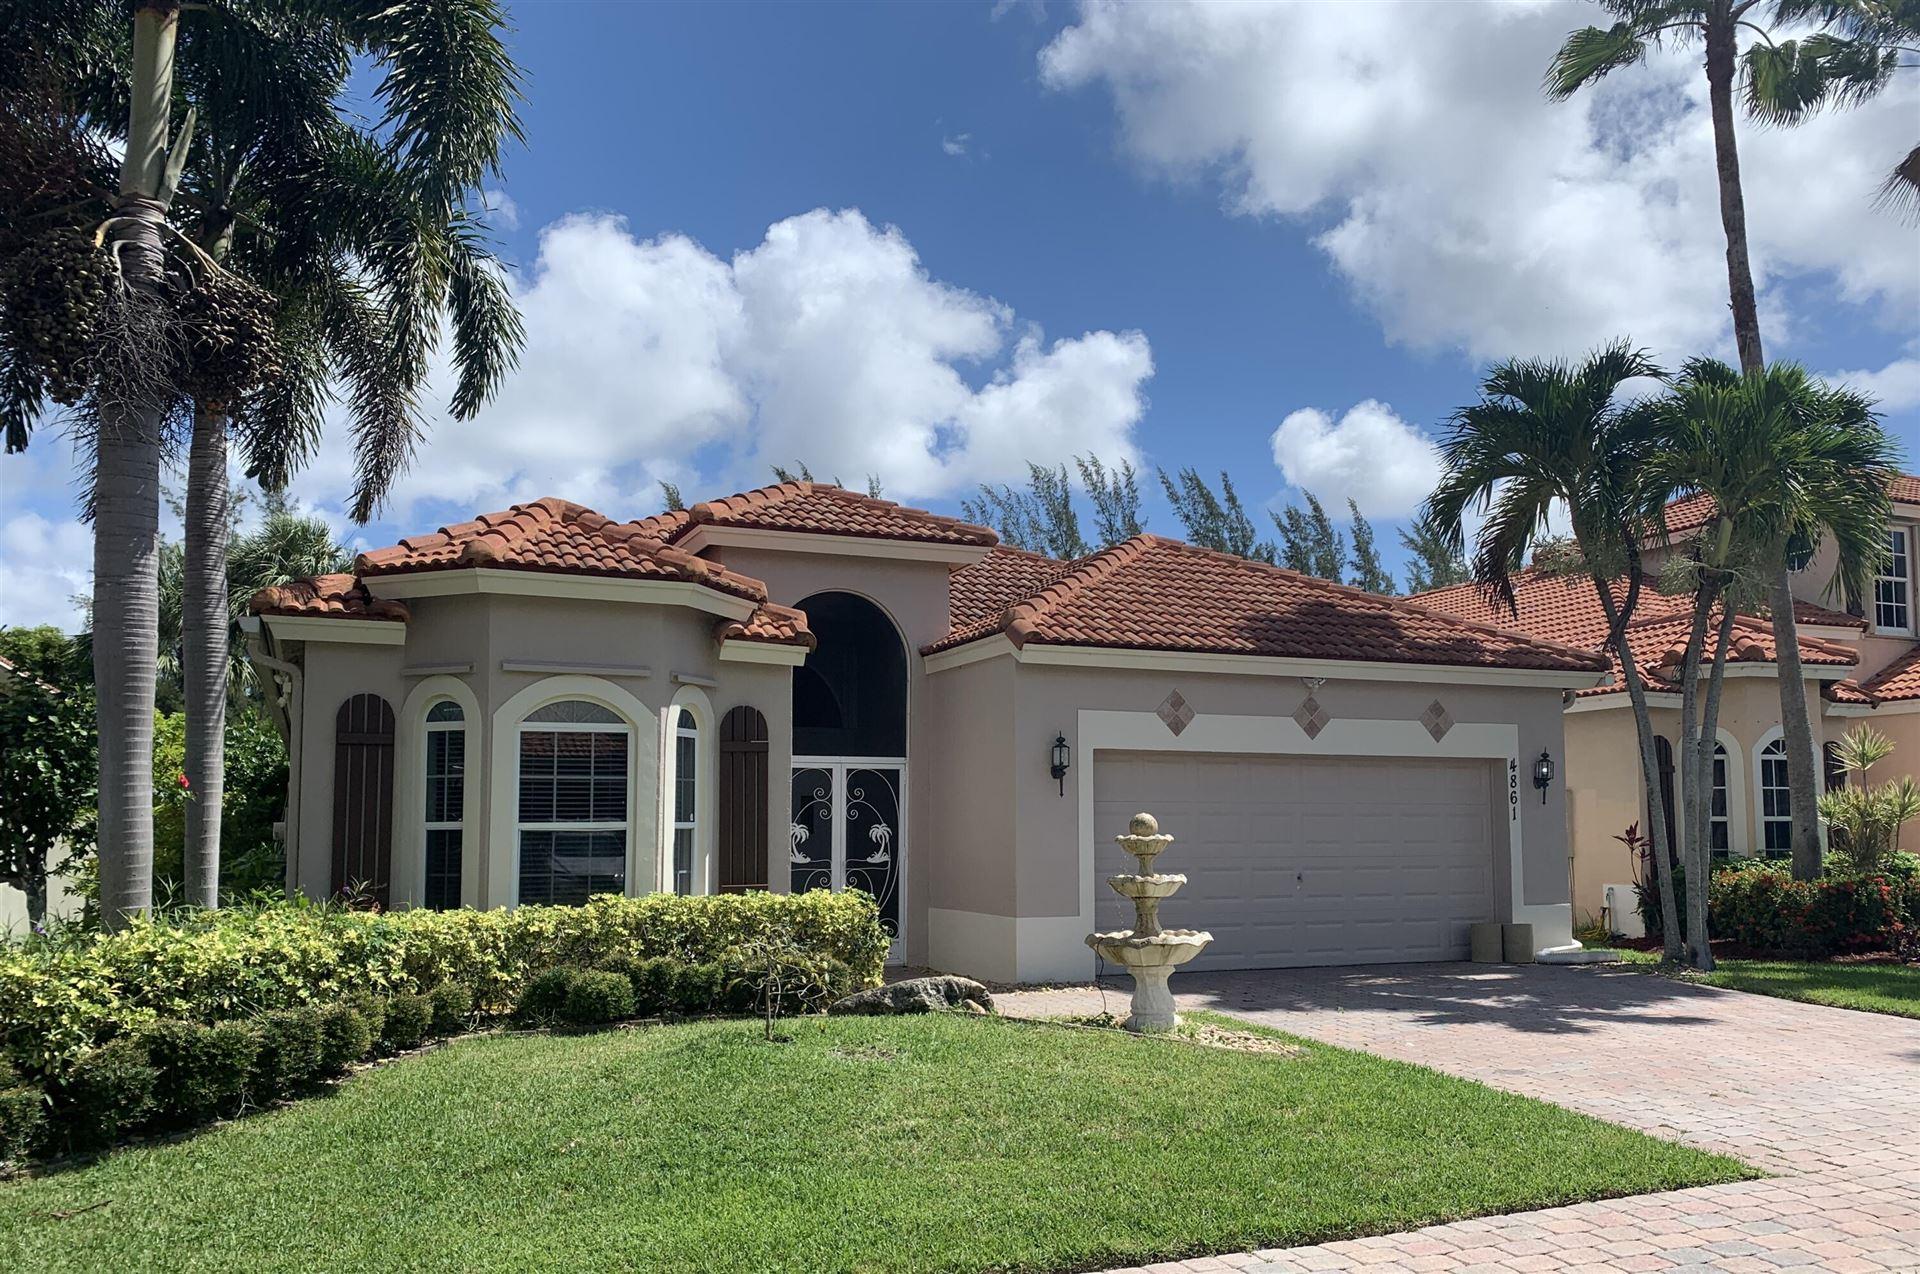 4861 Gateway Gardens Drive, Boynton Beach, FL 33436 - MLS#: RX-10727045